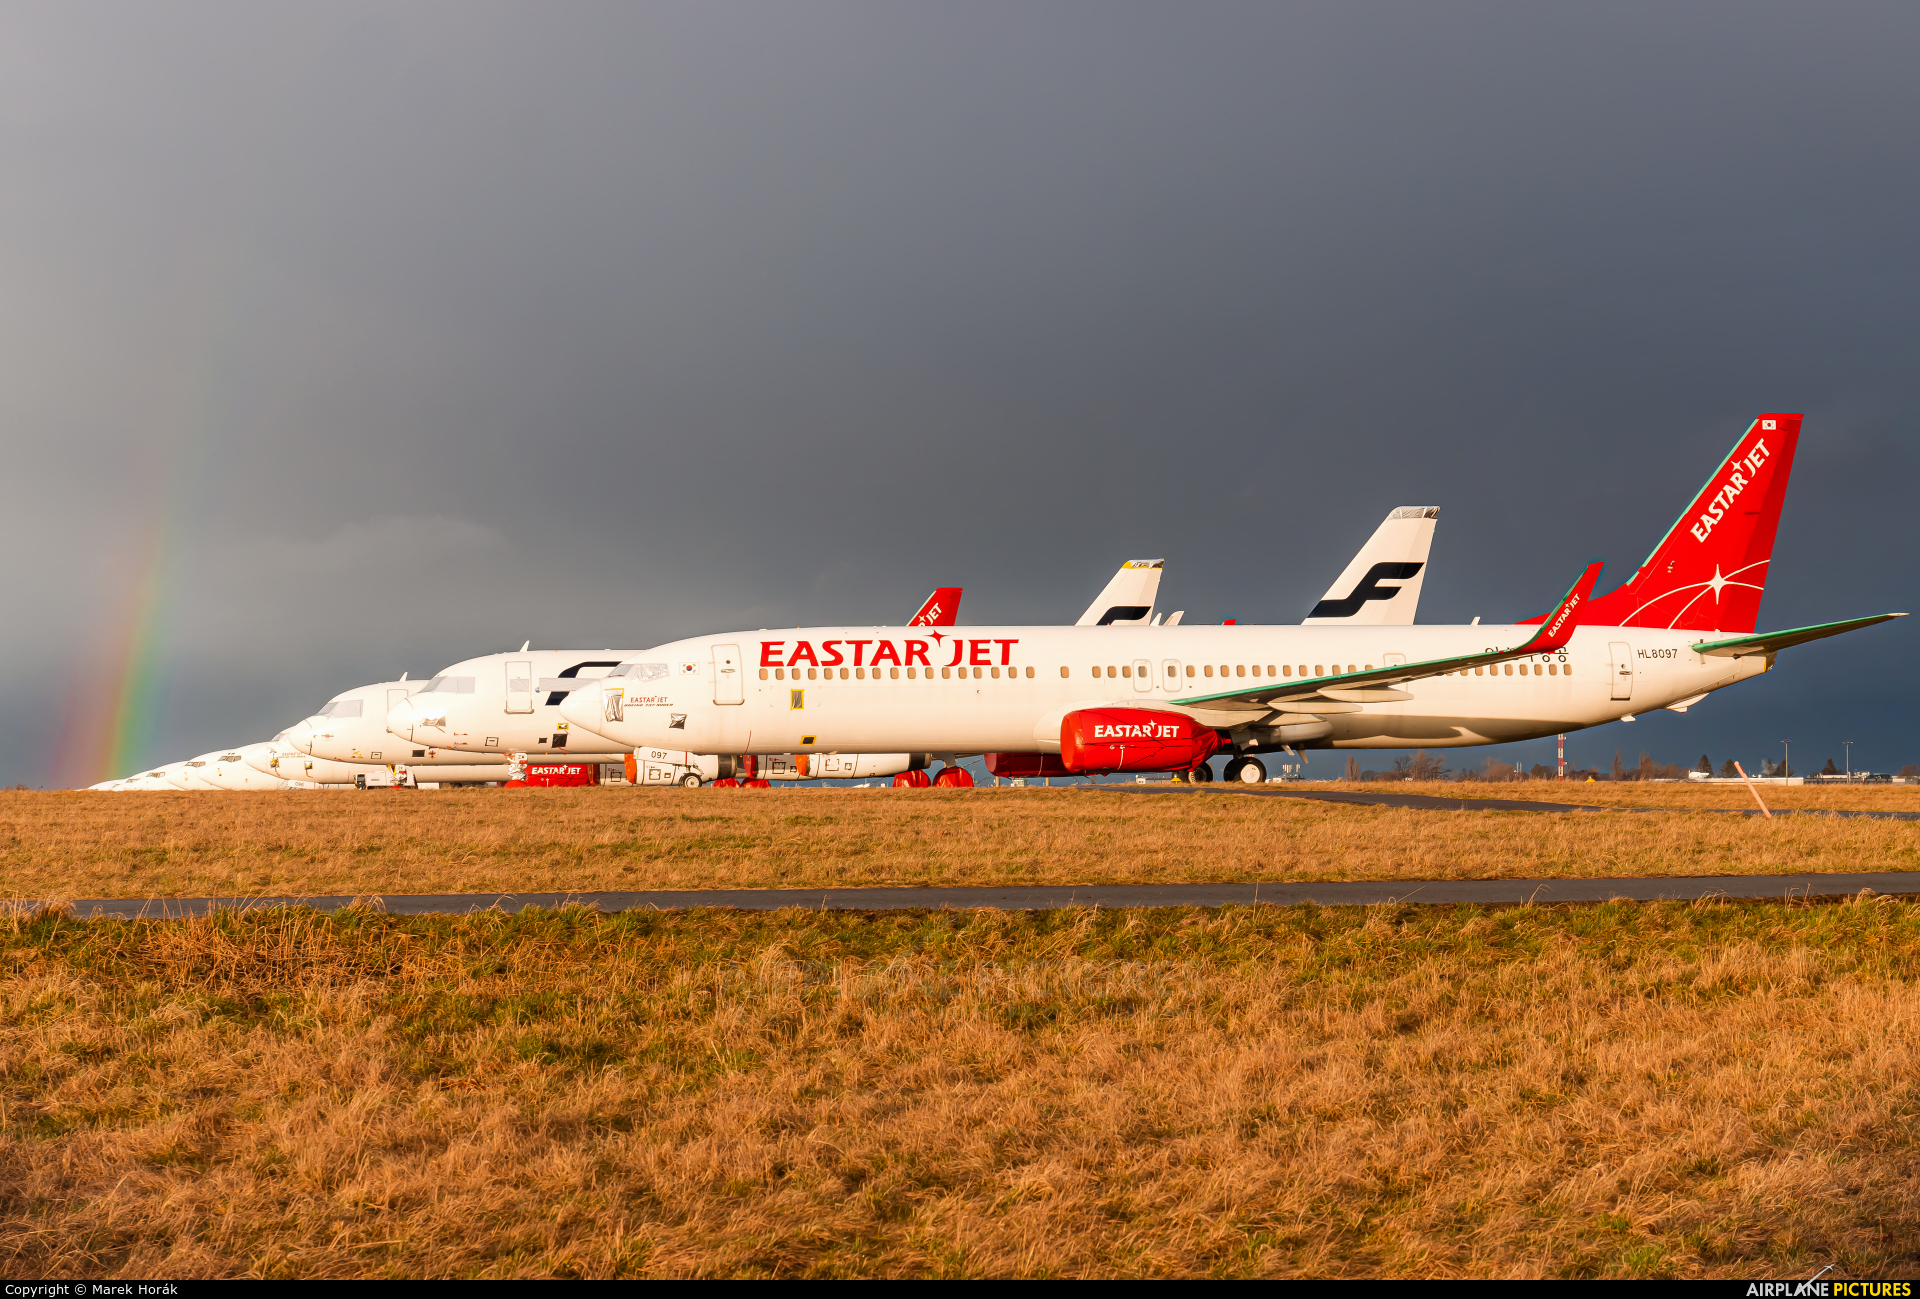 Eastar Jet HL8097 aircraft at Prague - Václav Havel